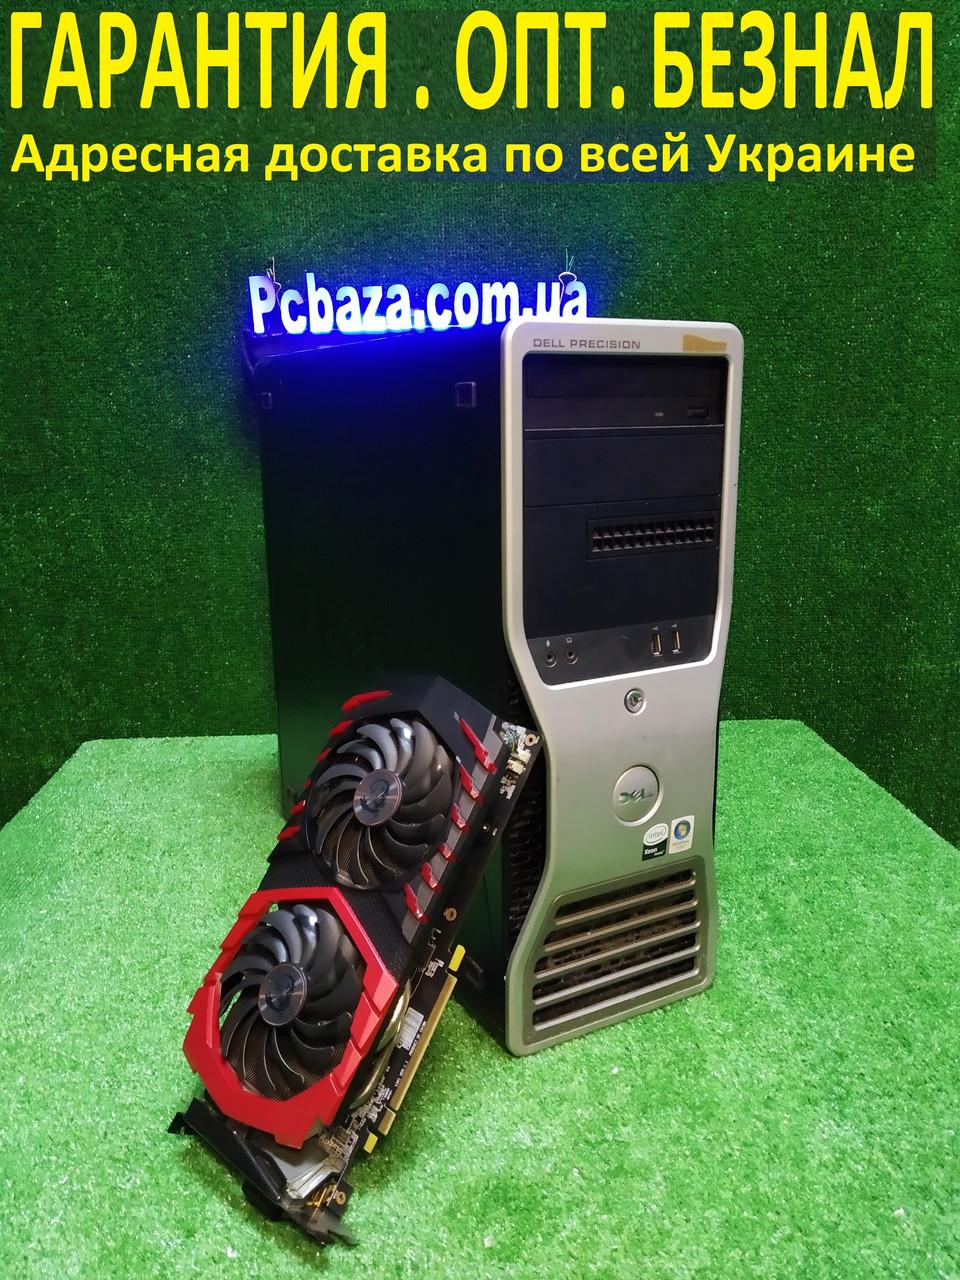 Игровой Настроенный Dell Precision t3500, 6(12) ядер, Core i7 (Xeon) 24gb ОЗУ, 250SSD, RX 470 4GB